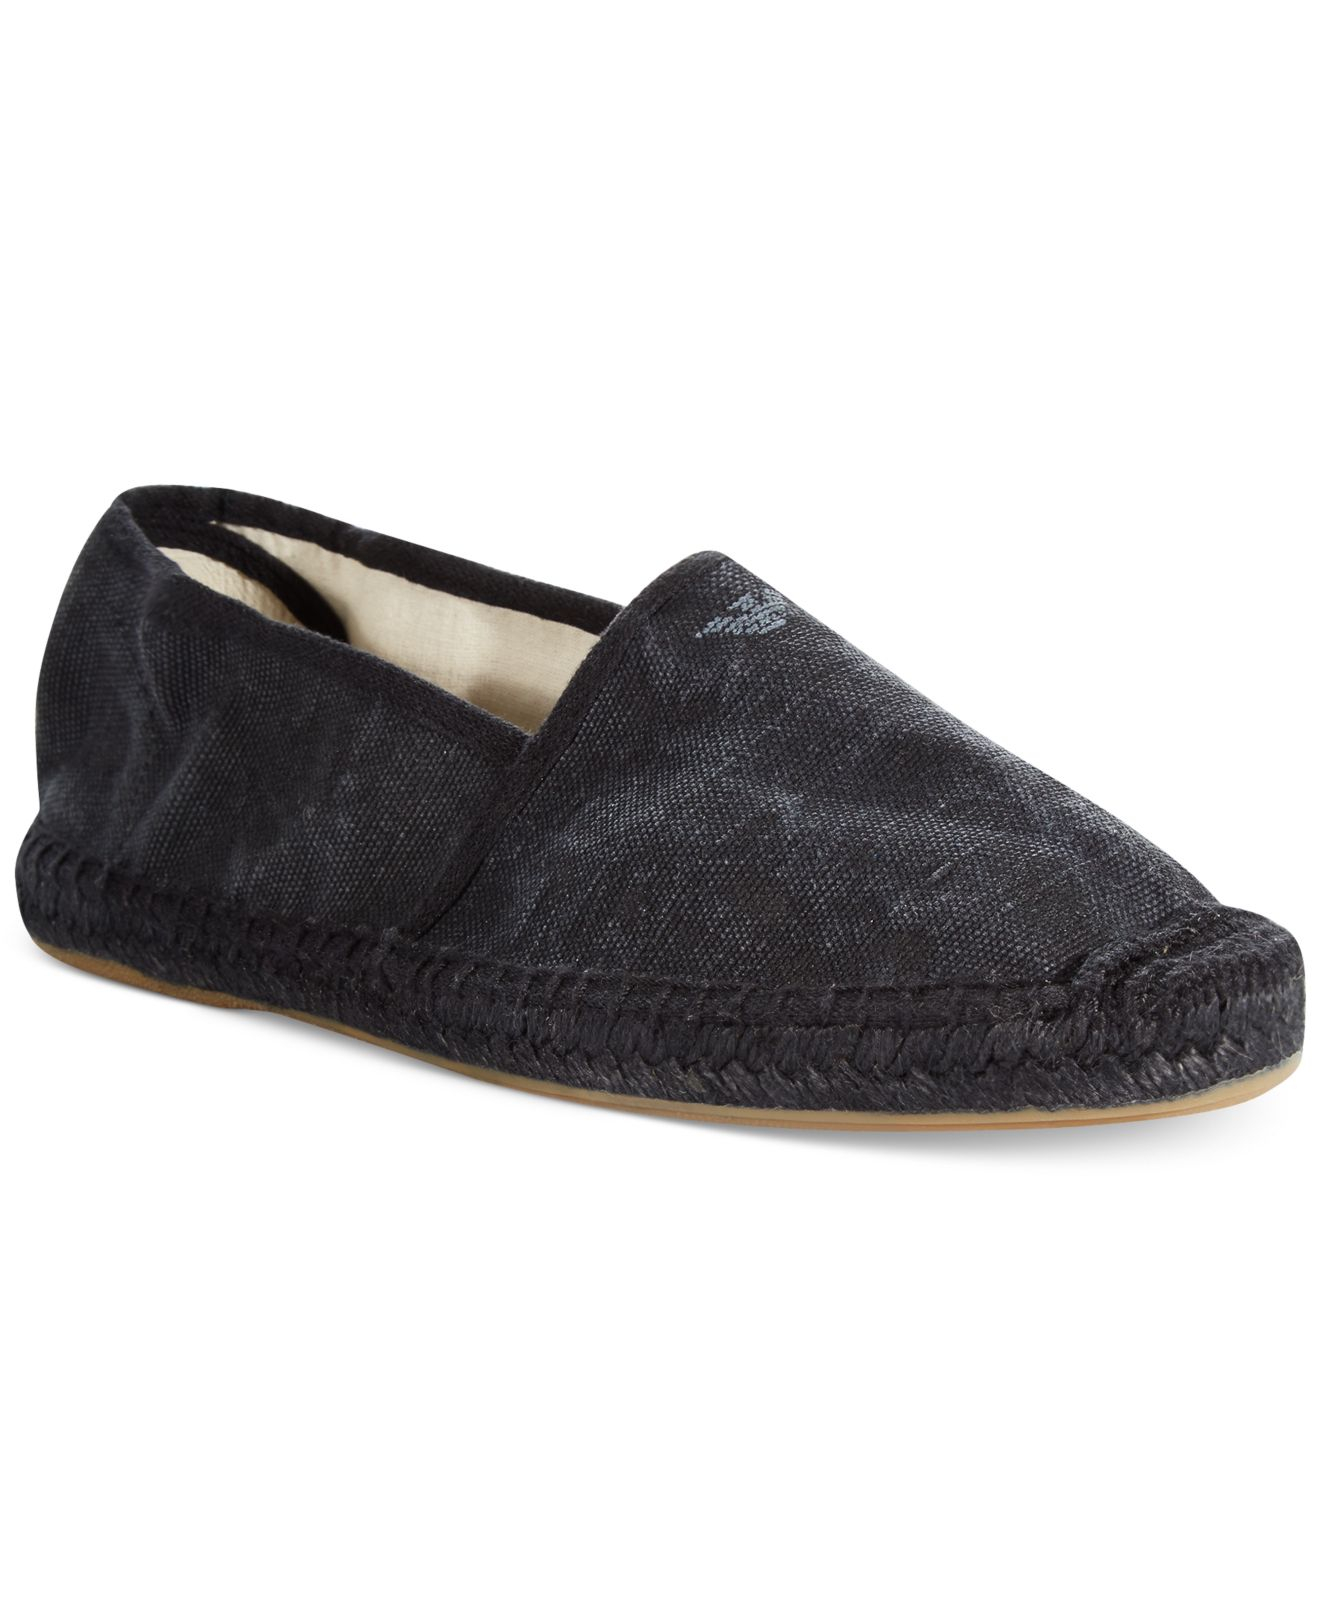 Chaussures - Espadrilles Armani B7r6o